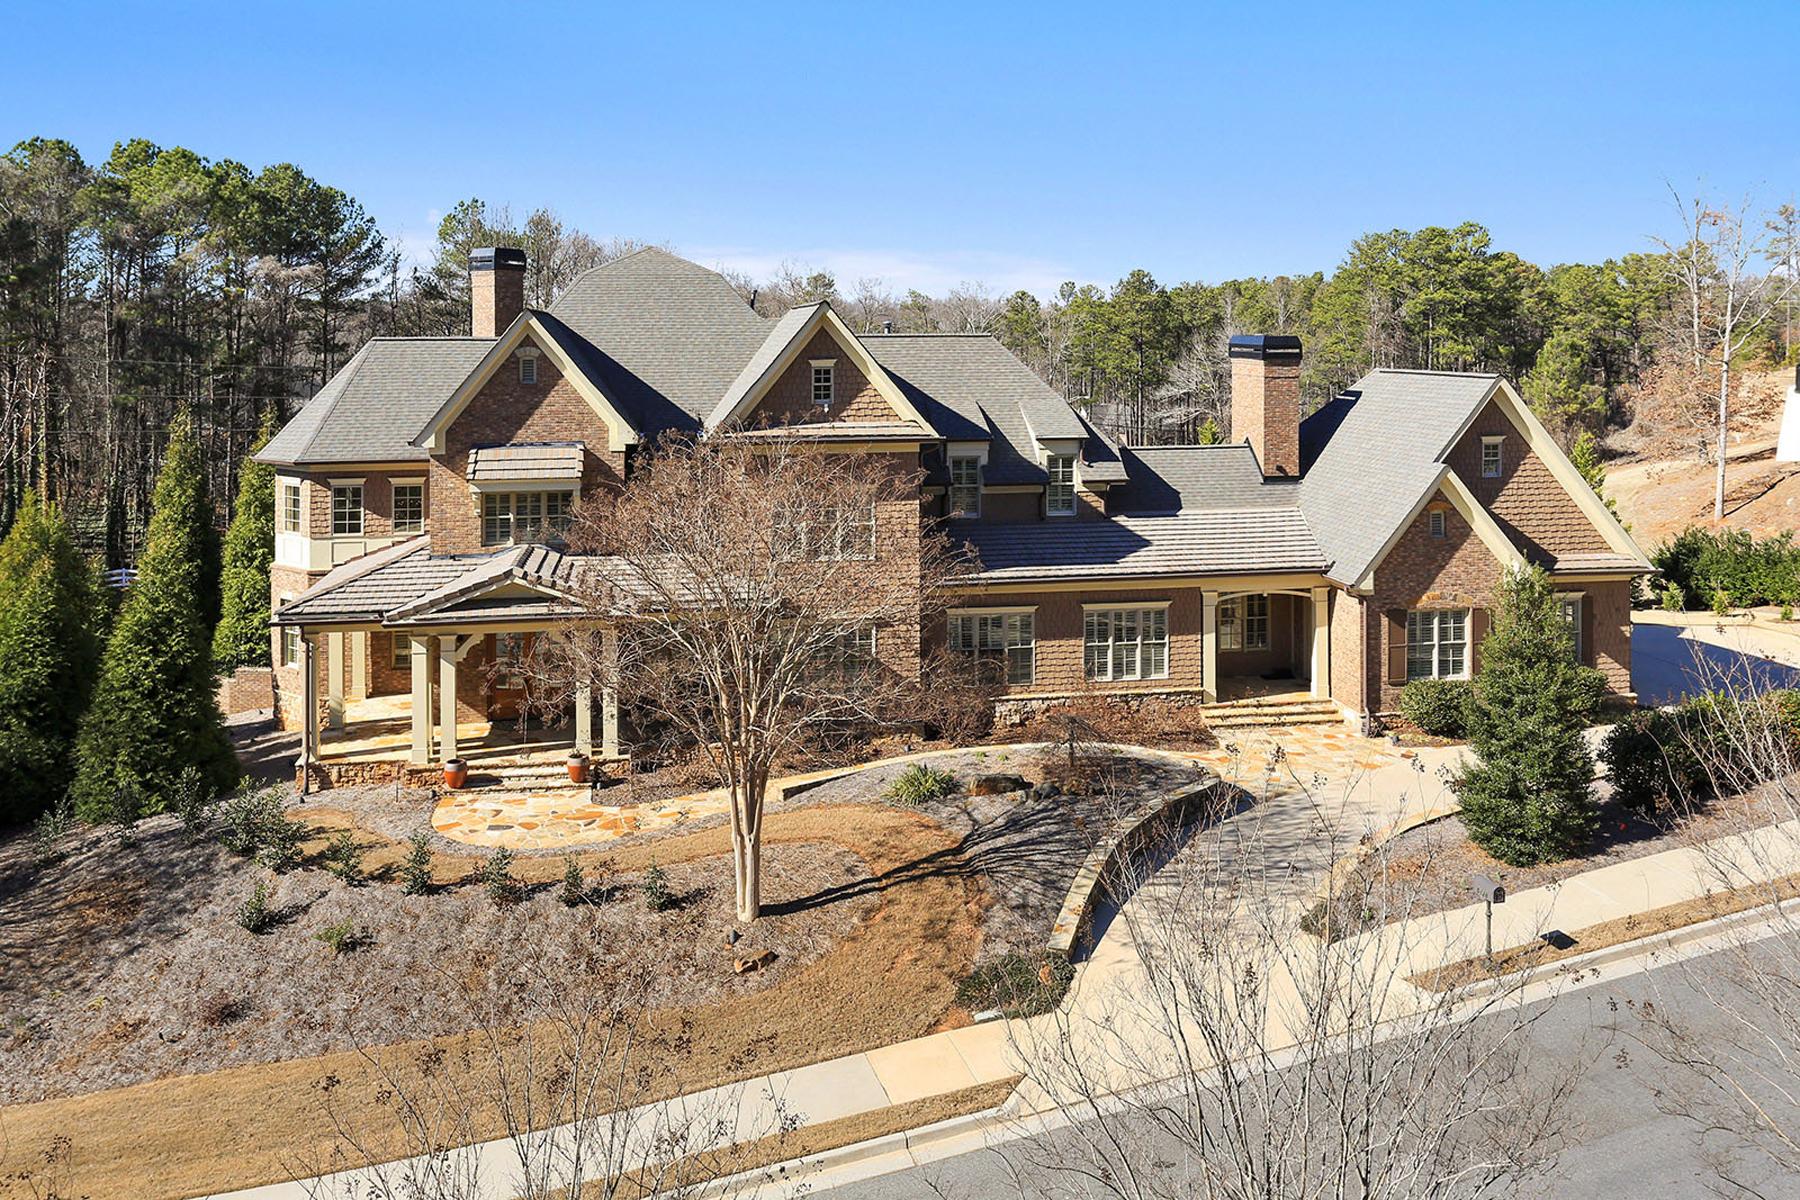 Casa Unifamiliar por un Venta en Stunning Home On Resort-Like Setting 5128 Pindos Pass Powder Springs, Georgia, 30127 Estados Unidos